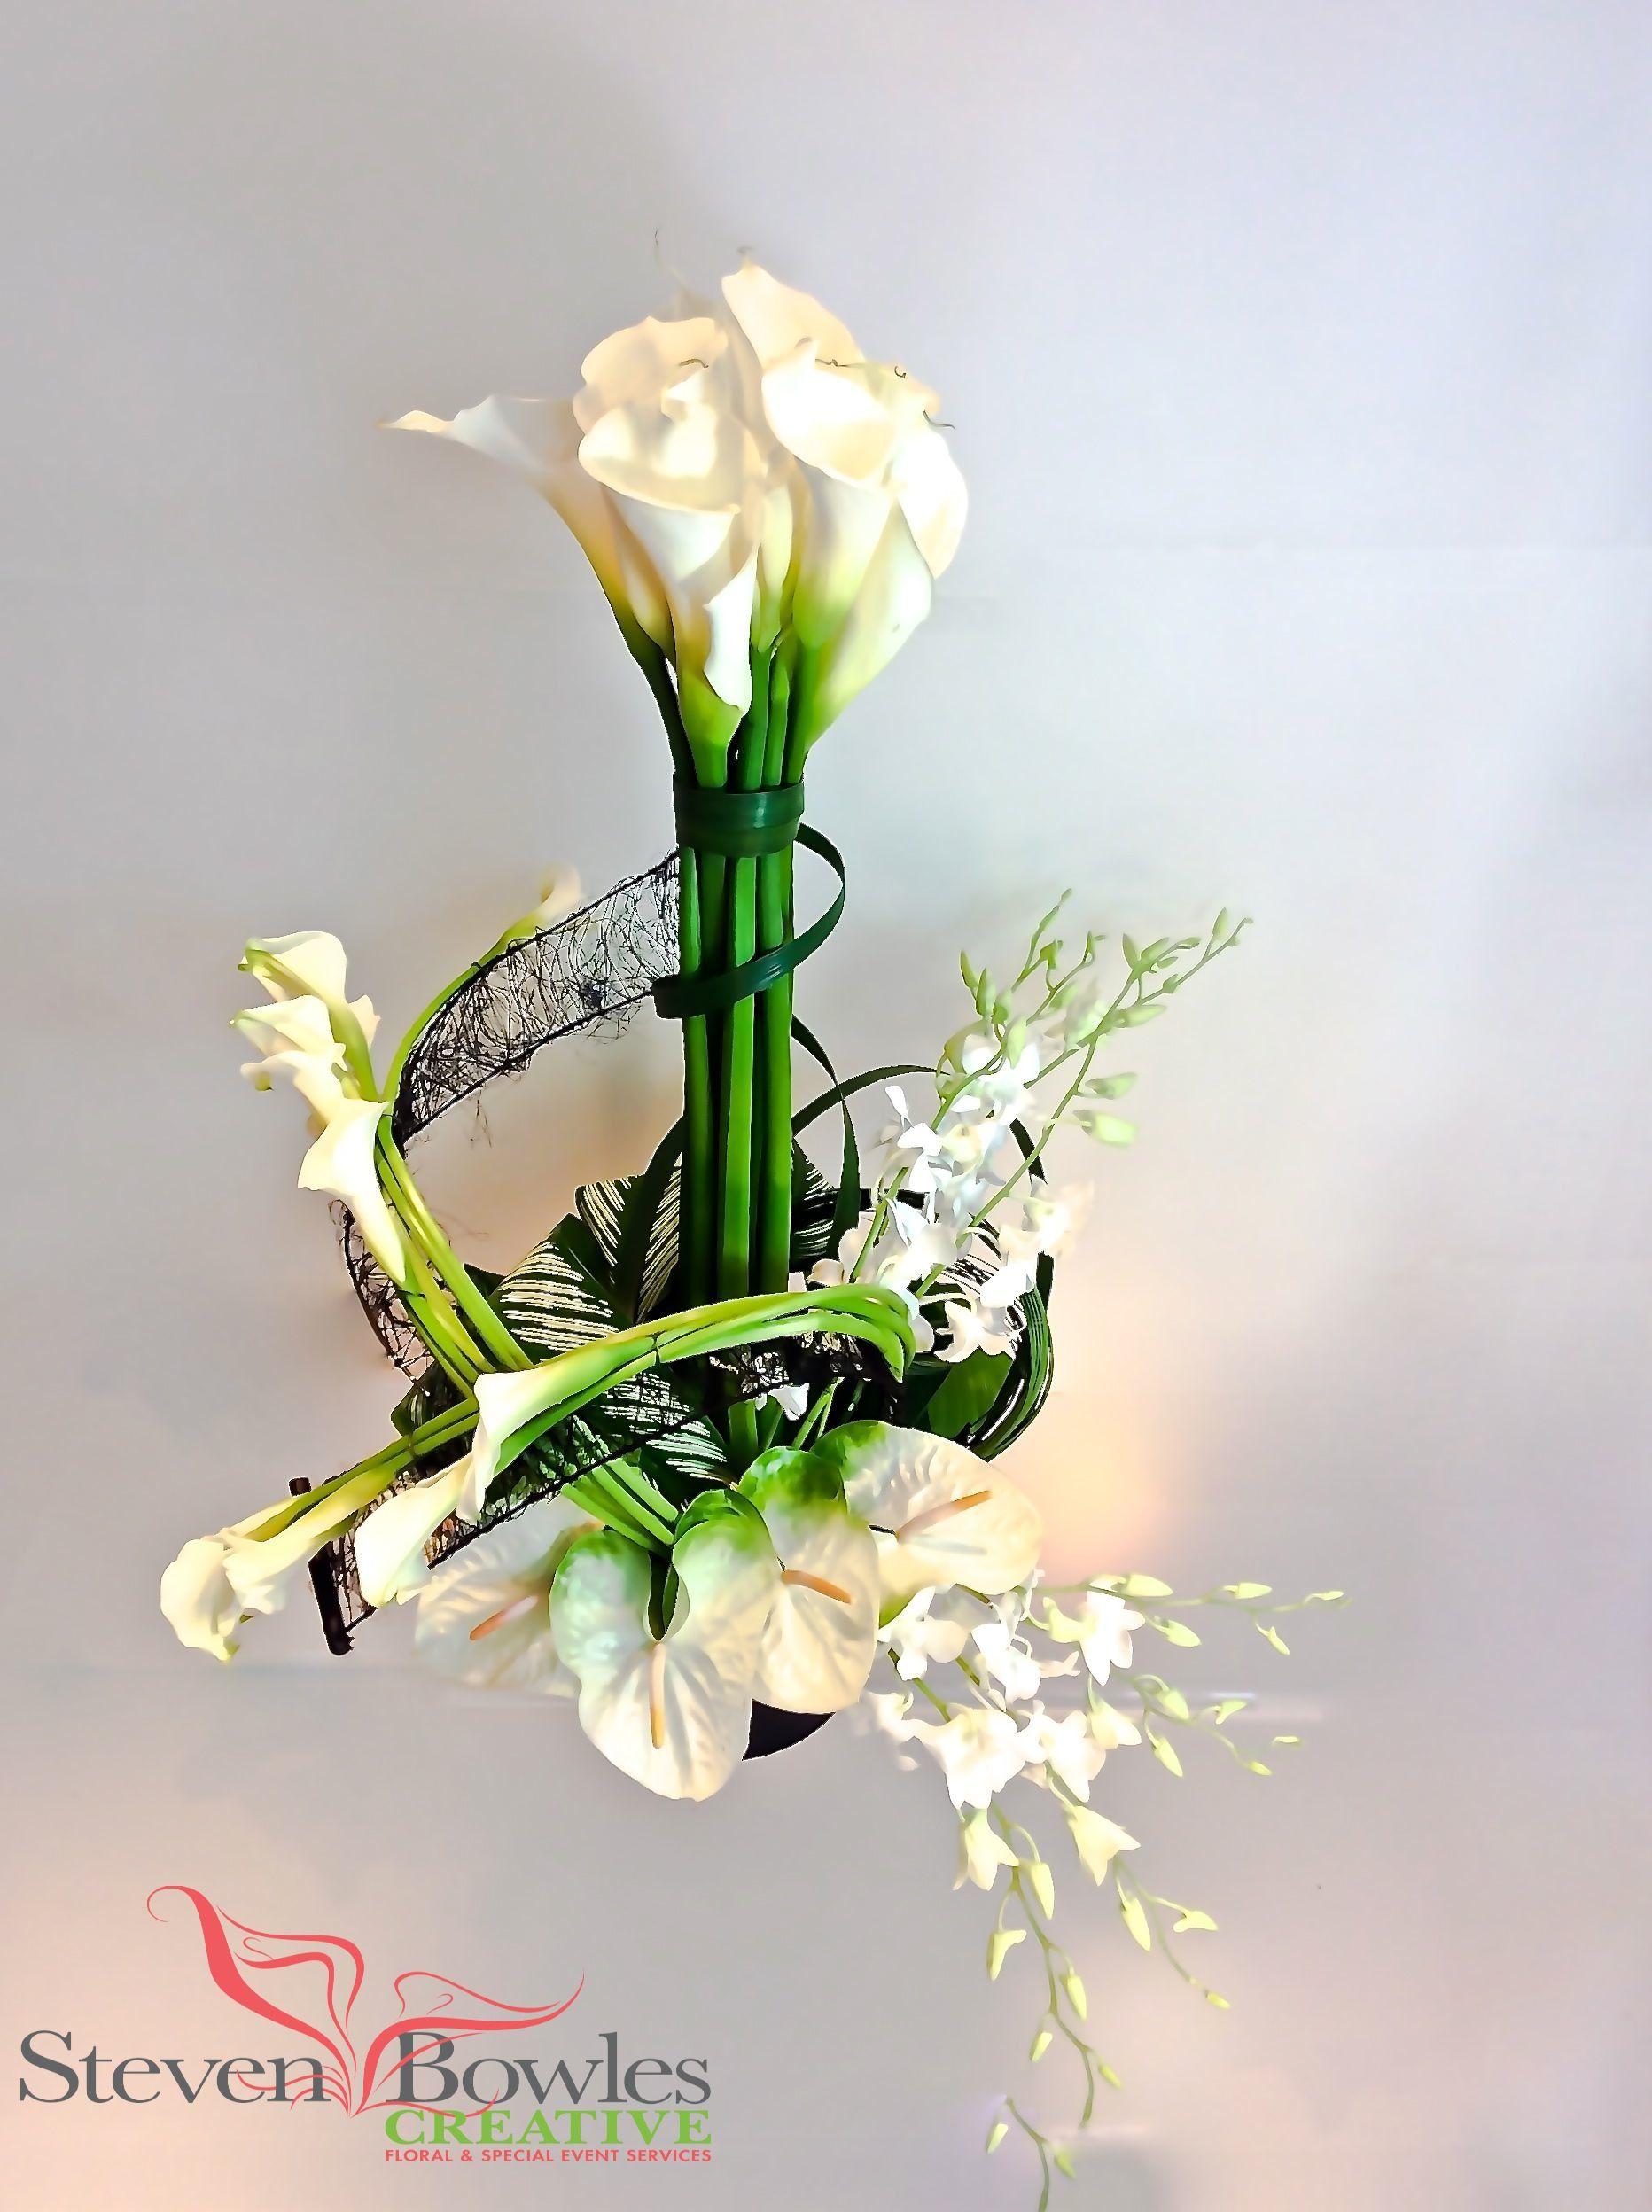 Modern Calla Lily Floral Arrangement Designed By Steven Bowles Creative Floral And Event Desi Pohoronnye Cvetochnye Kompozicii Cvetochnye Kompozicii Kompoziciya